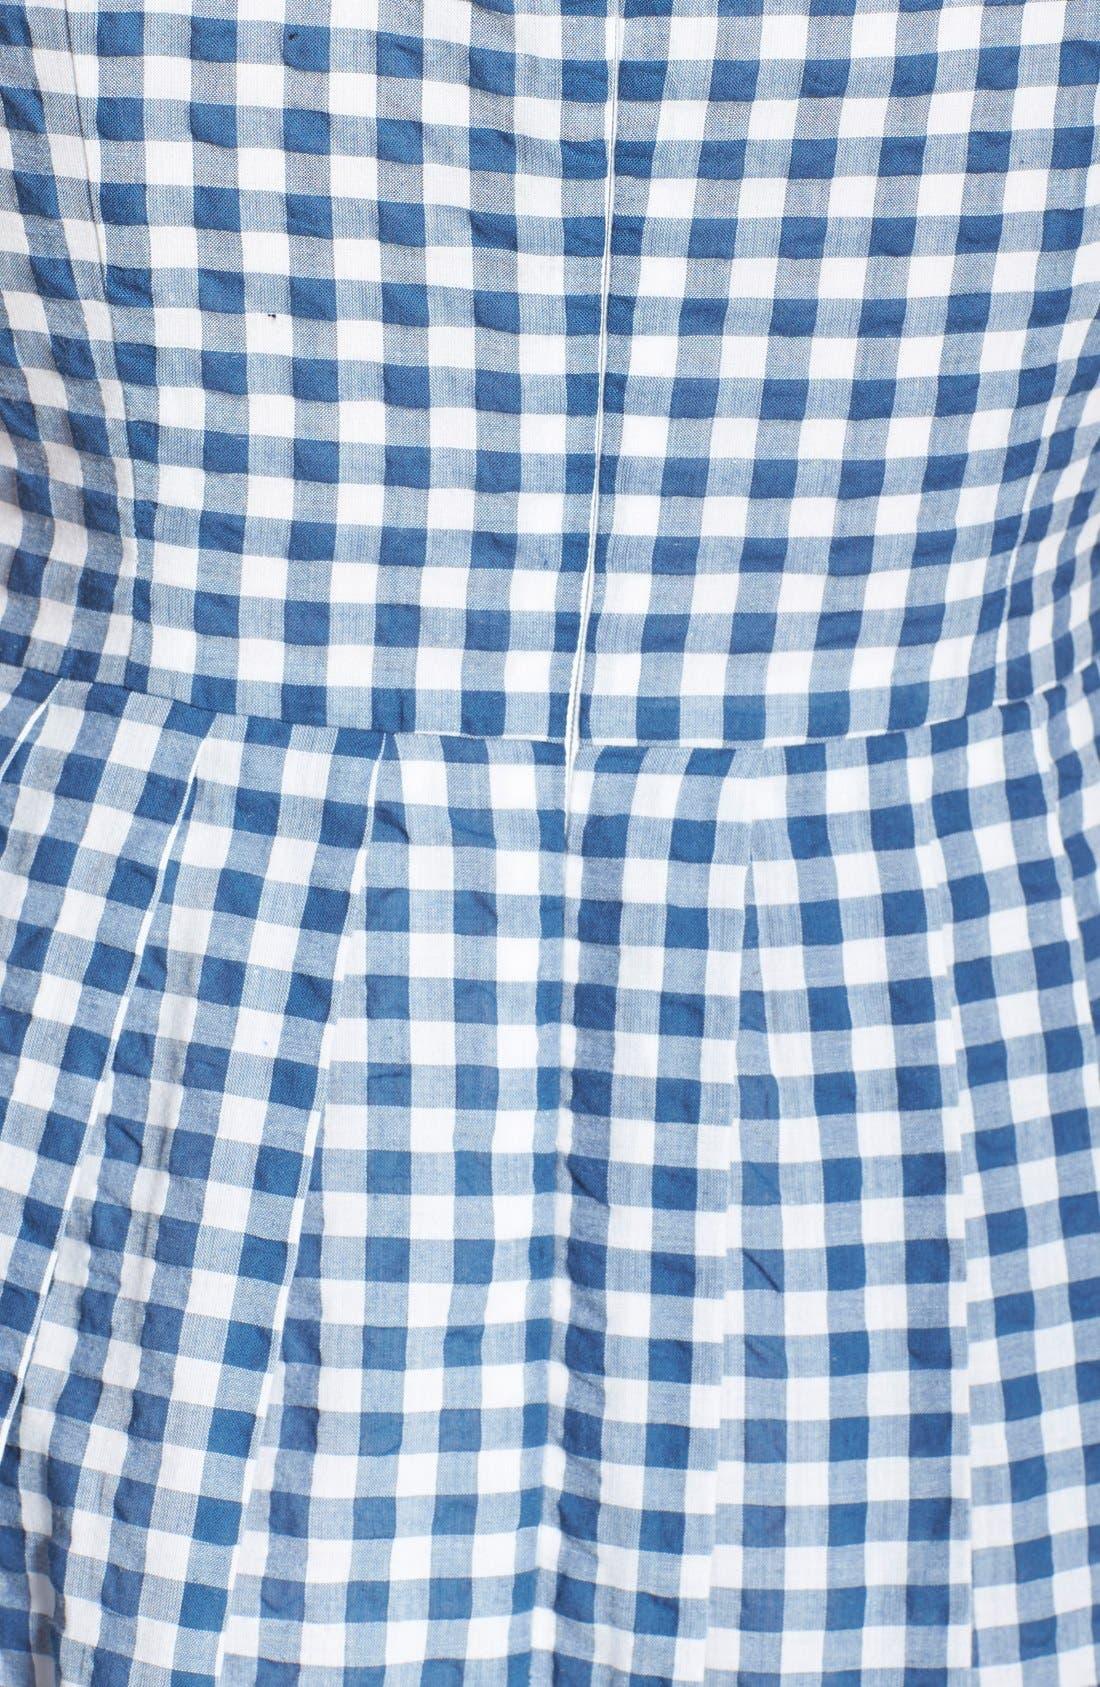 Gingham Cotton Fit & Flare Midi Dress,                             Alternate thumbnail 2, color,                             400